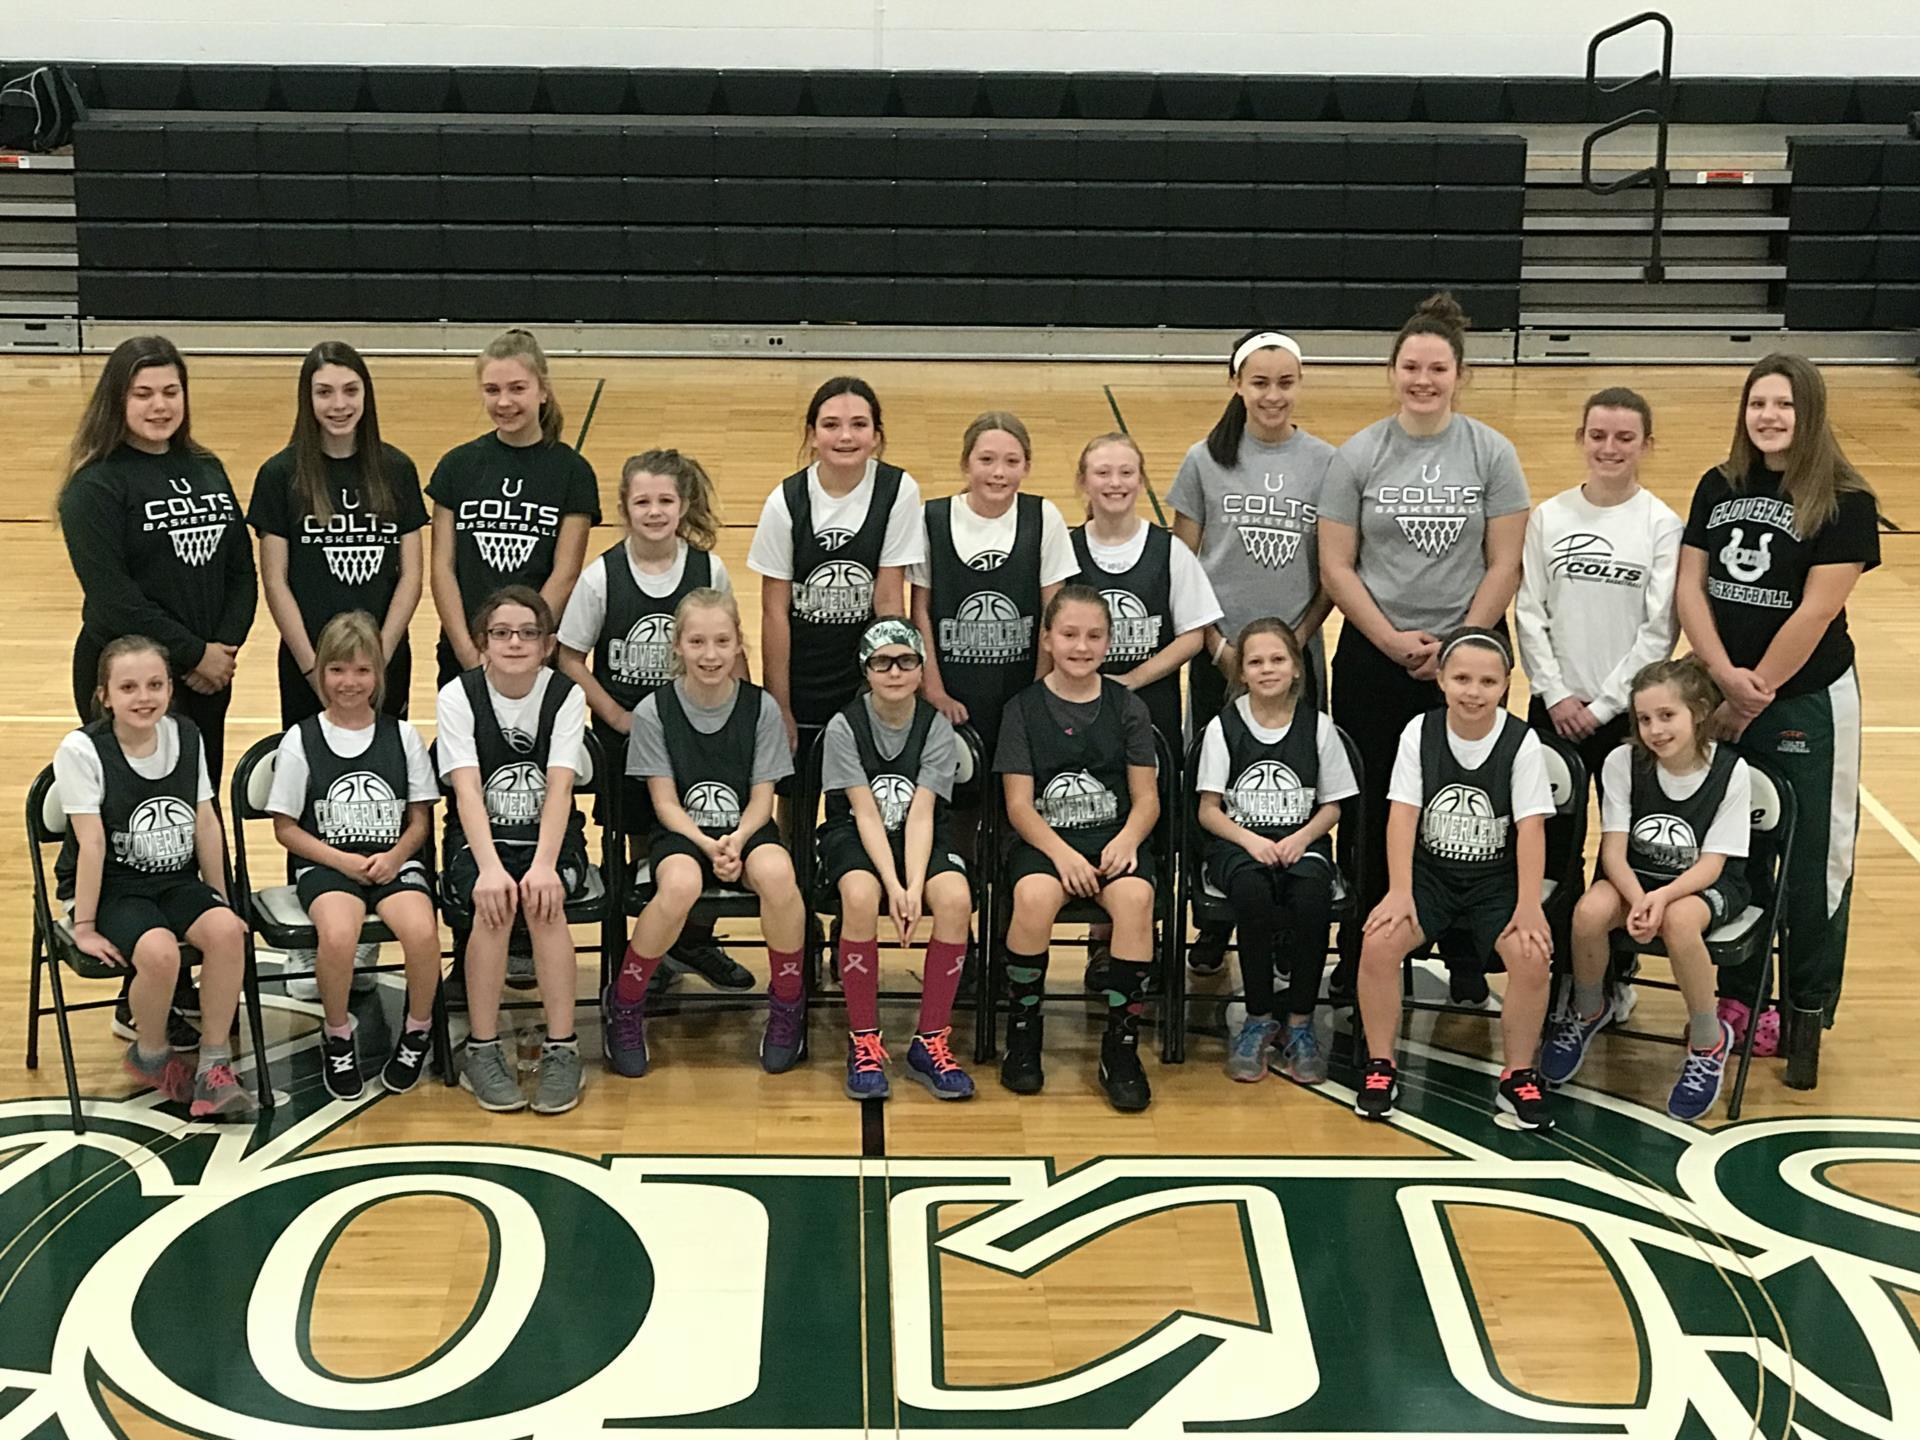 Cloverleaf youth girls basketball